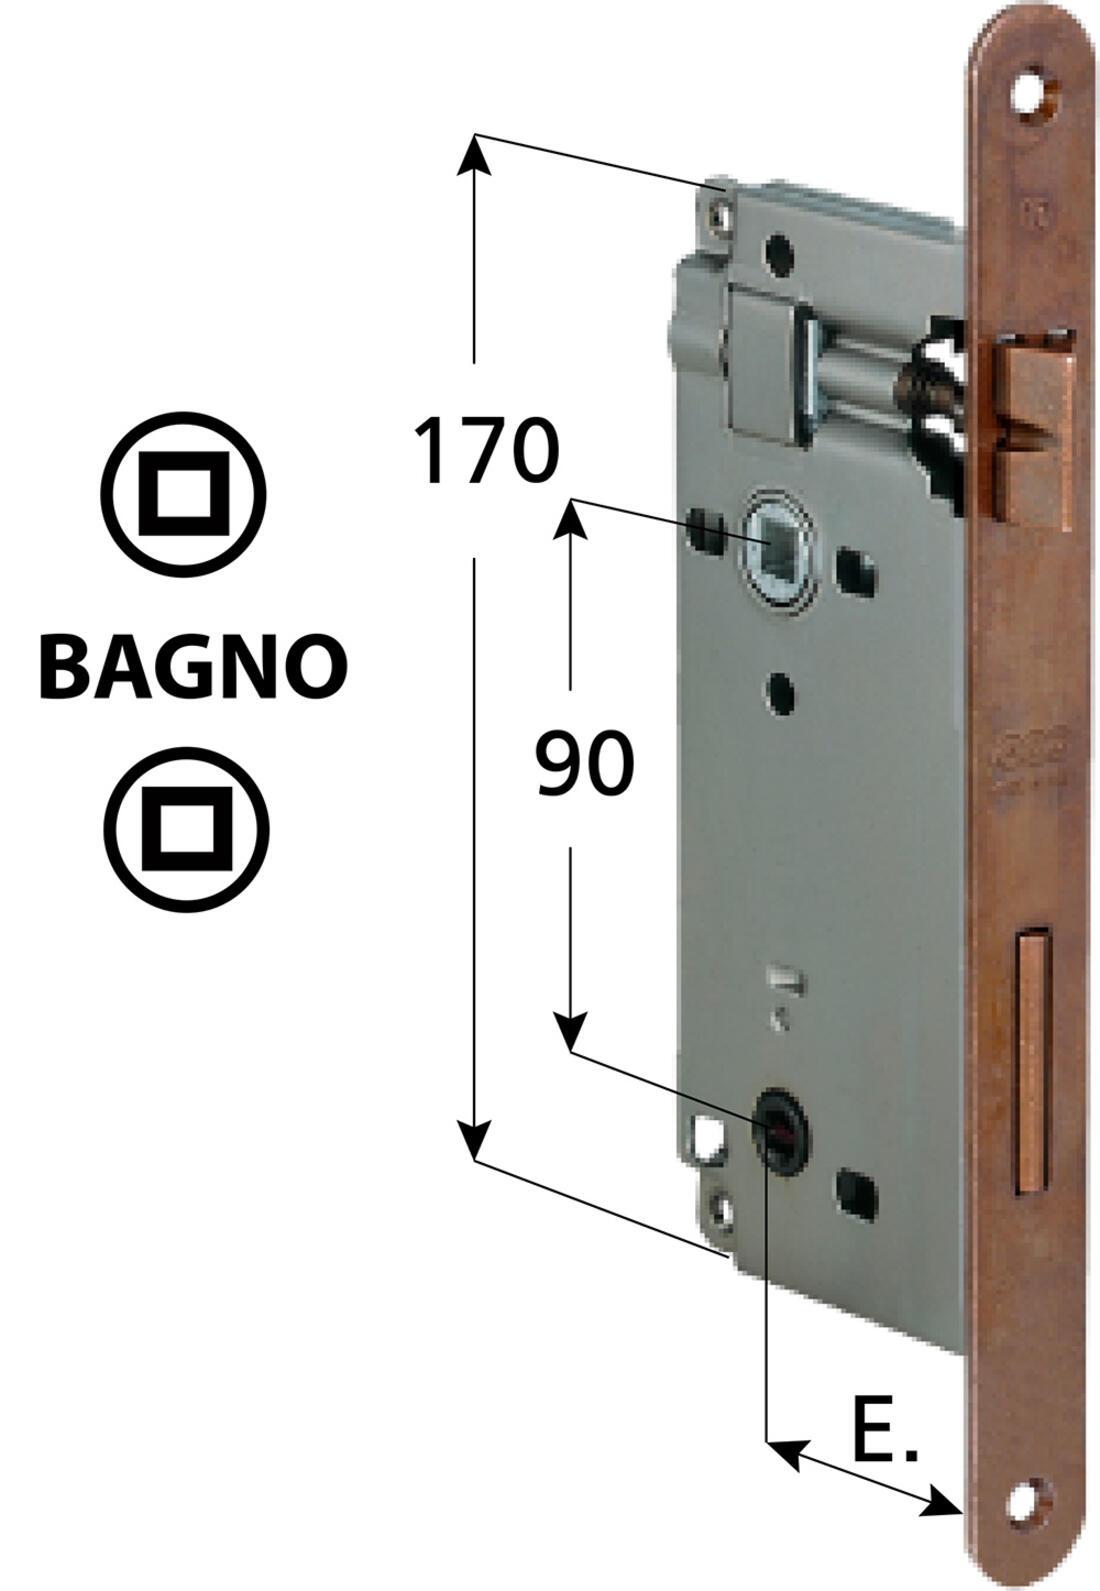 SERRATURA PATENT BAGNO GRANDE BRONZATA AGB - Serrature